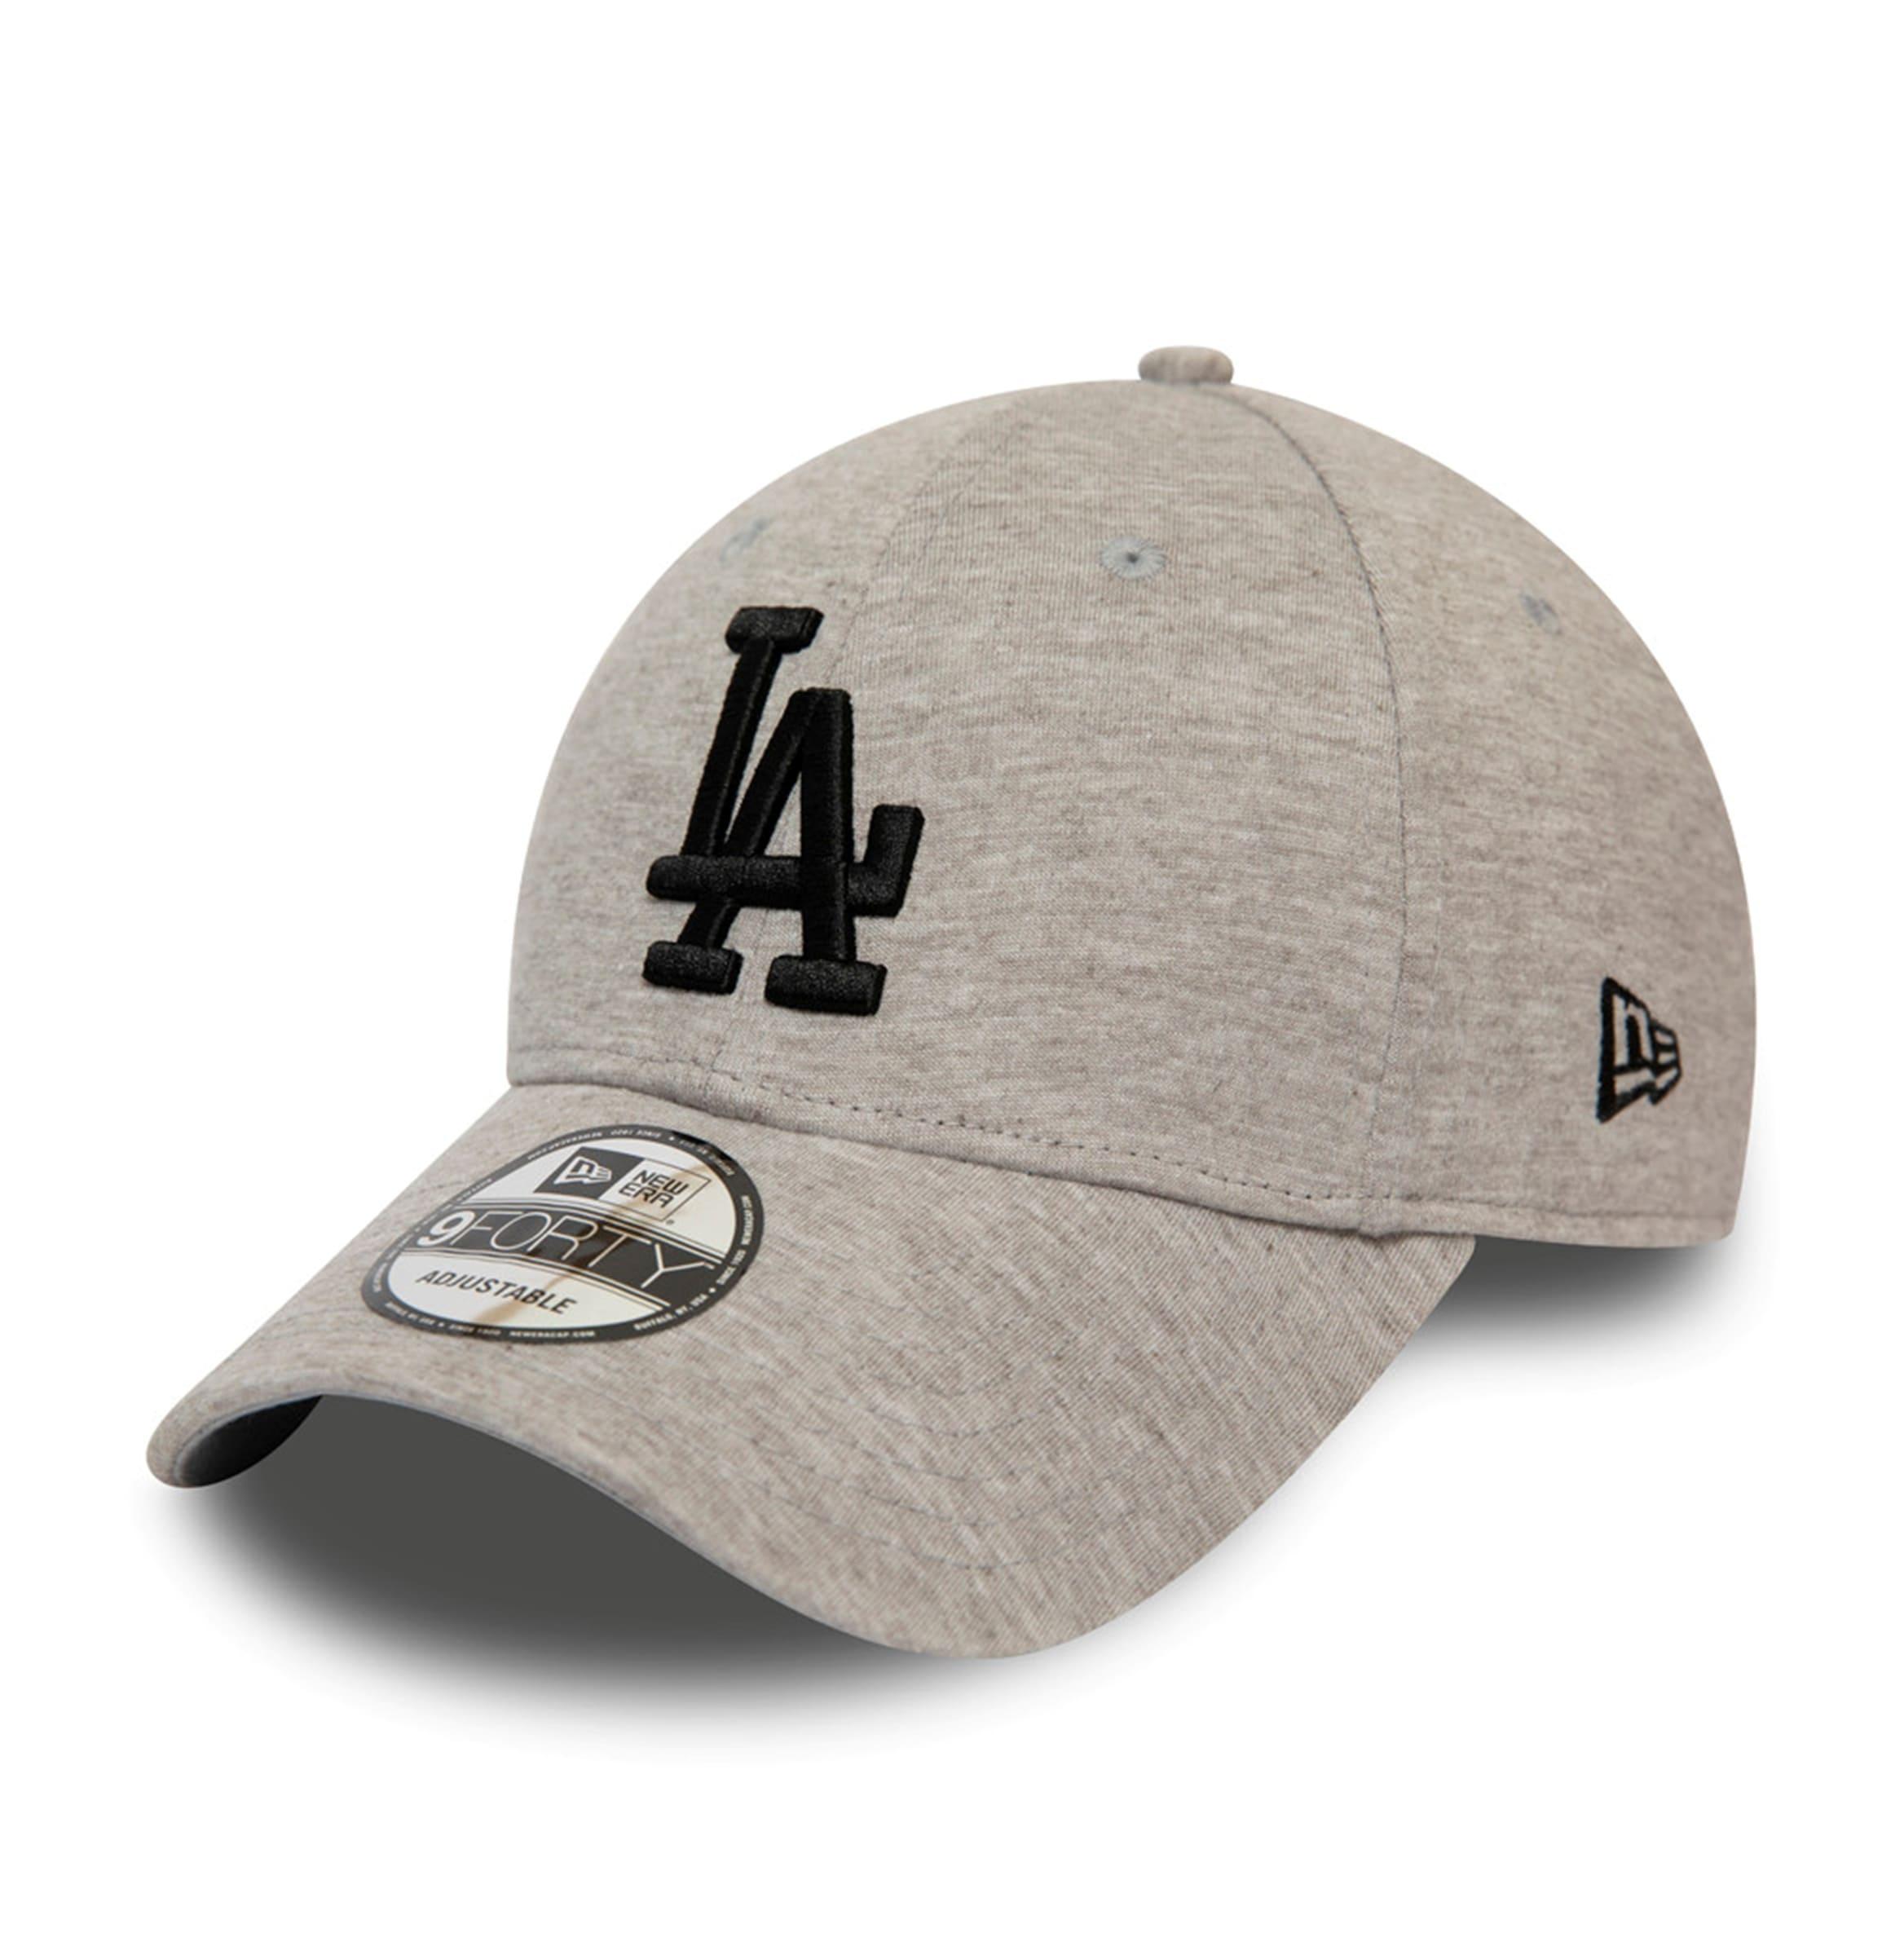 https://www.leadermode.com/195486/new-era-cap-jersey-essential-9forty-12490234-gra.jpg